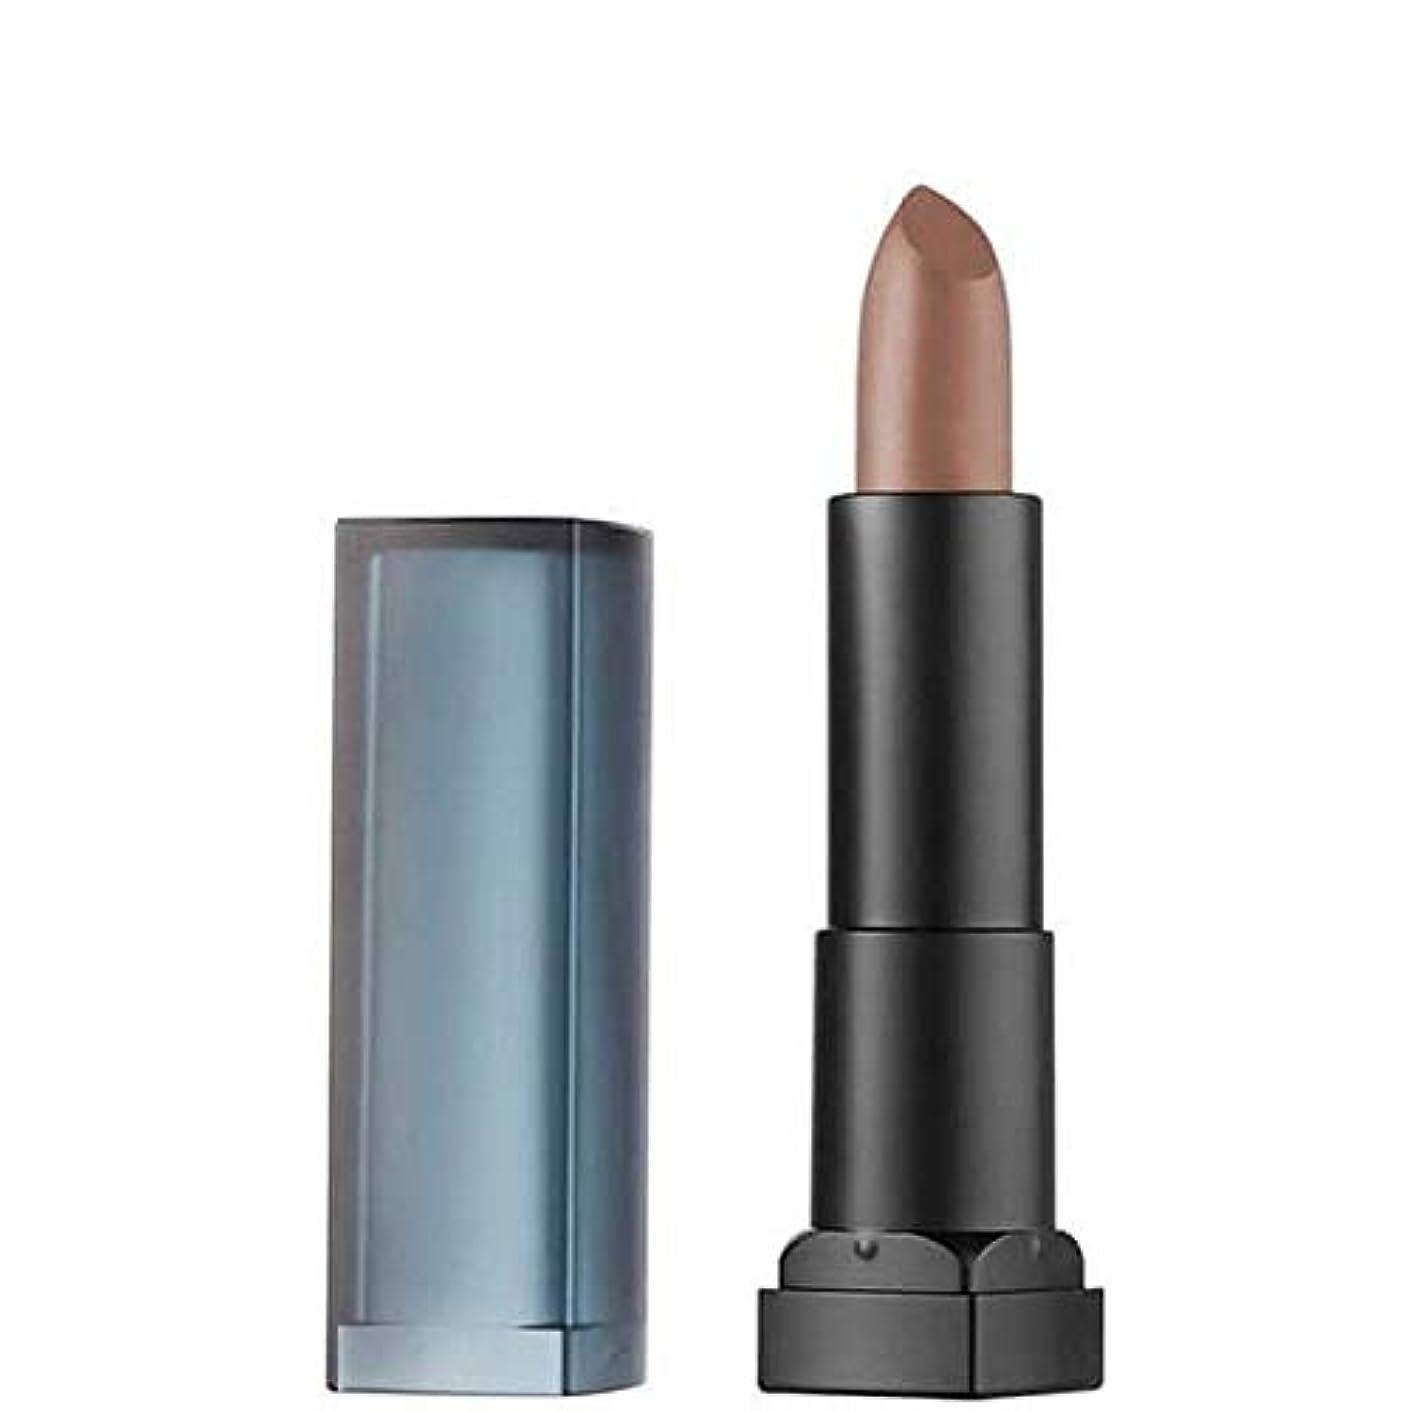 [Maybelline ] メイベリンカラーセンセーショナルなマット口紅15スモーキートープ - Maybelline Color Sensational Matte Lipstick 15 Smoky Taupe [並行輸入品]